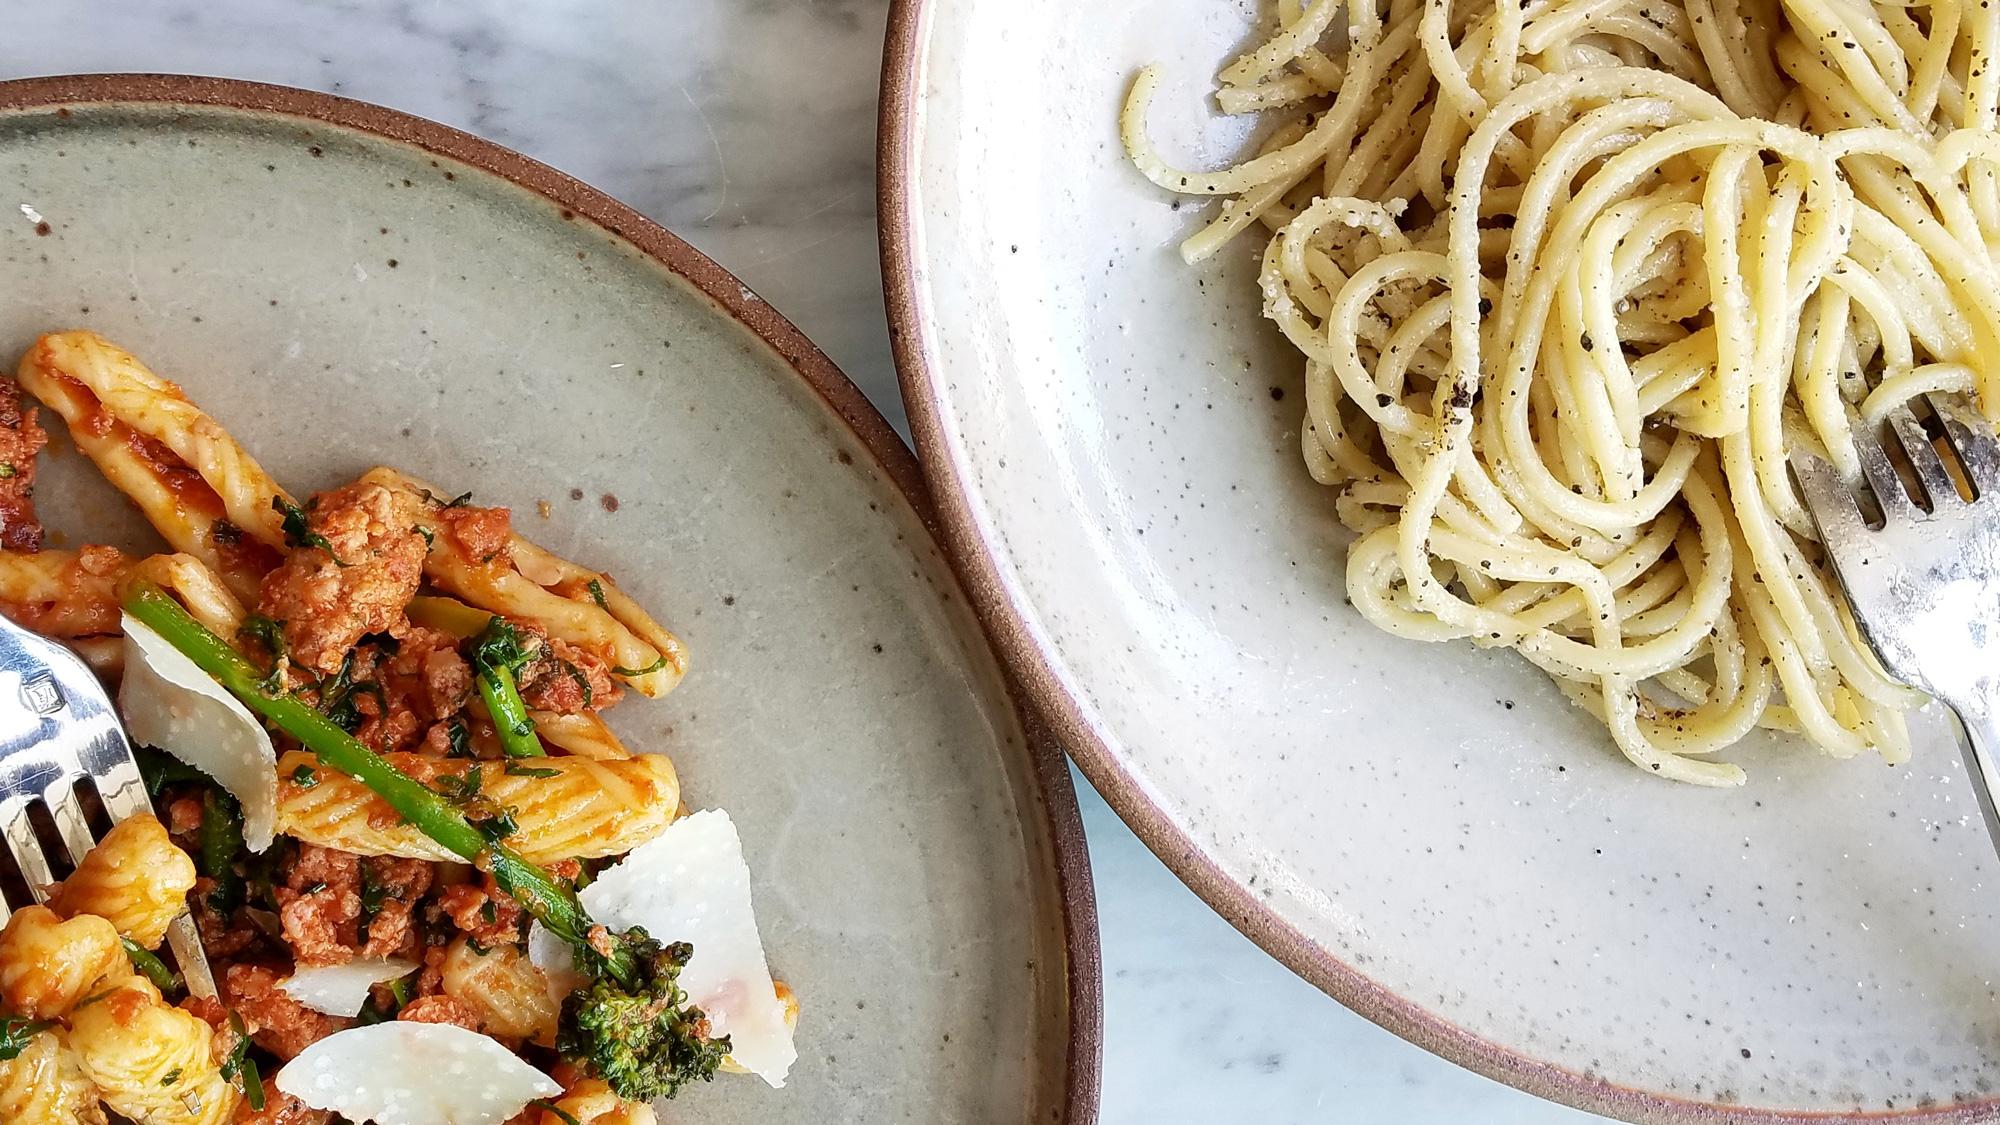 Capunti with sausage sugo, broccoli di cicco, peperoncino, and pecorino